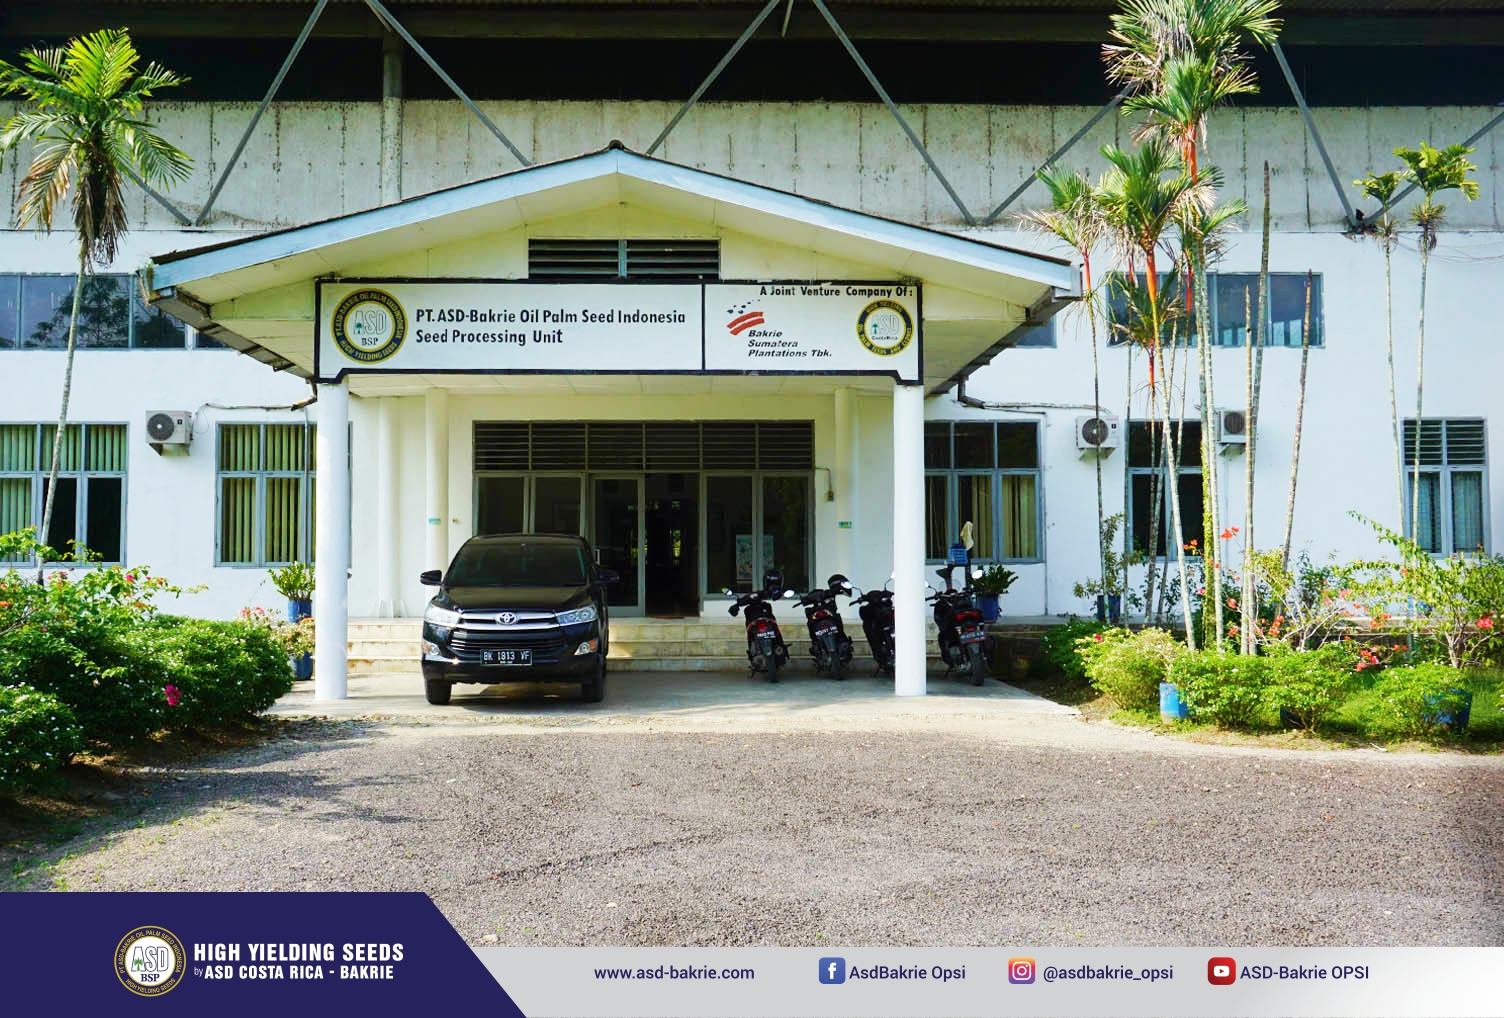 Seed Processing Unit PT ASD-Bakrie Oil Palm Seed Indonesia - Kisaran, Sumatera Utara